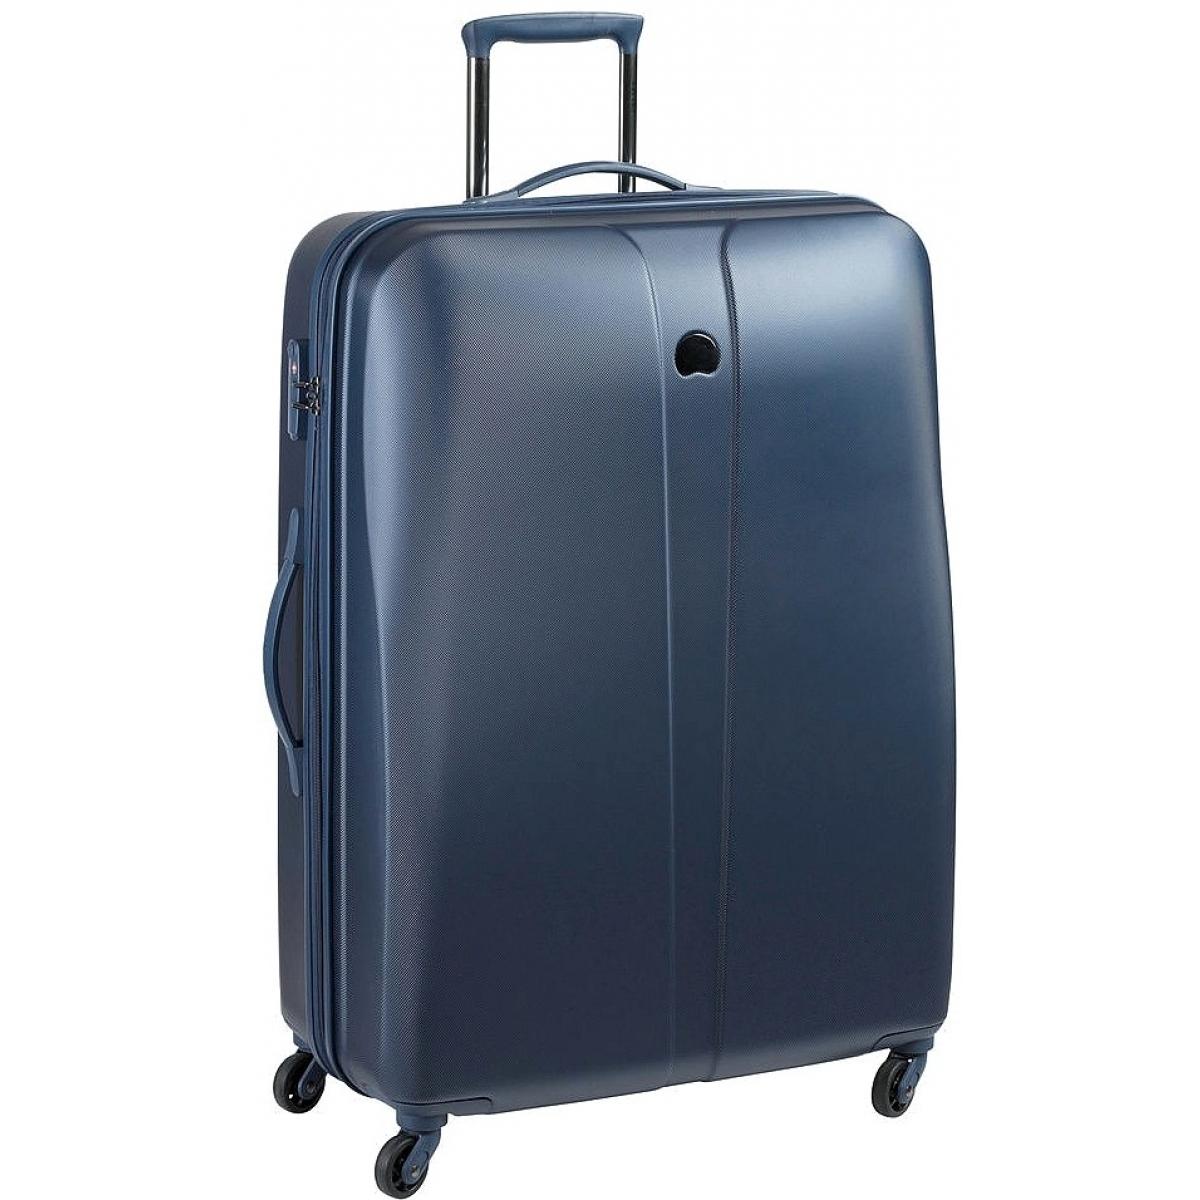 valise delsey schedule 2 grande taille 76 cm marine schedule2 821 m couleur principale. Black Bedroom Furniture Sets. Home Design Ideas